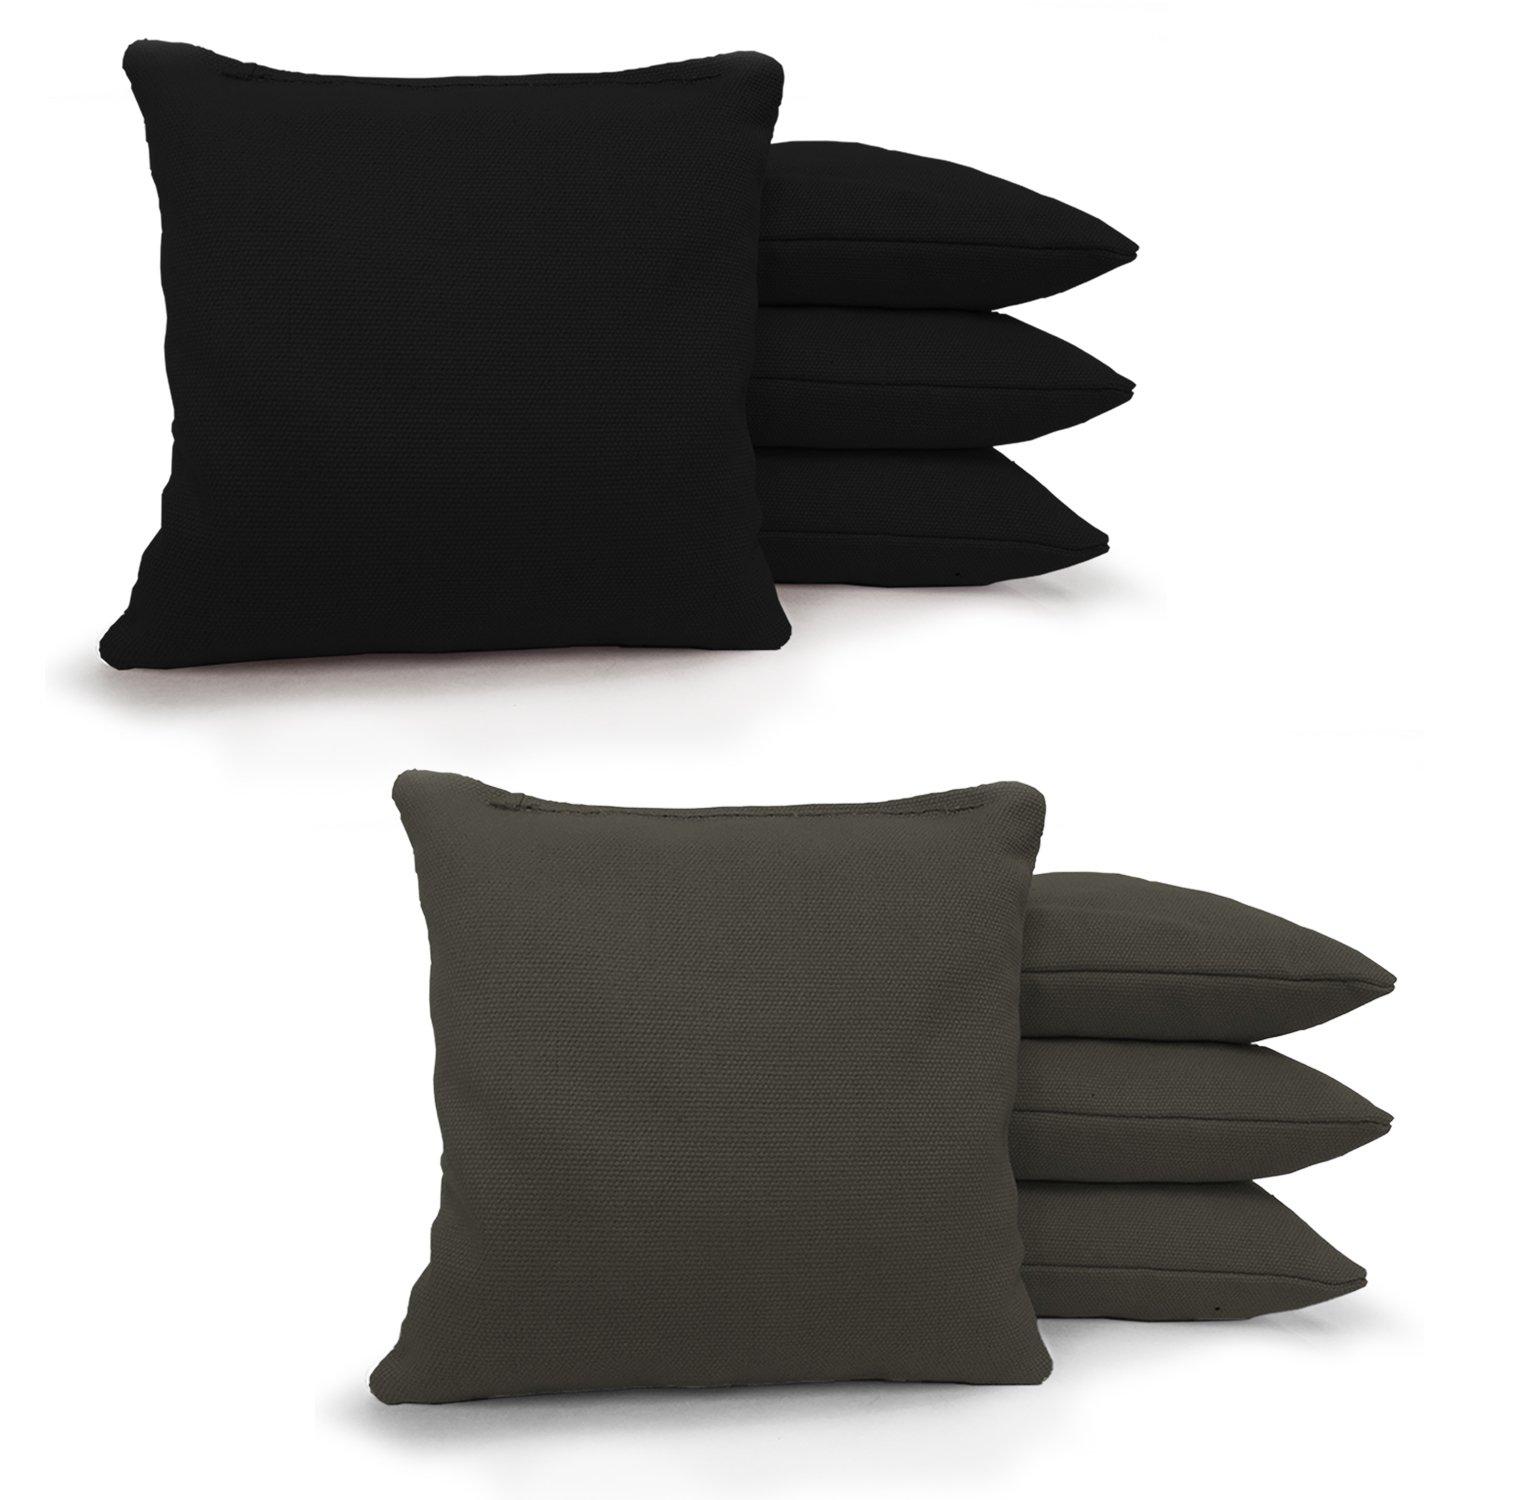 Johnson Enterprises, LLC 8 Standard Corn Filled Regulation Duck Cloth Cornhole Bags 17 Colors Available (You Pick)!! (Black/Charcoal)